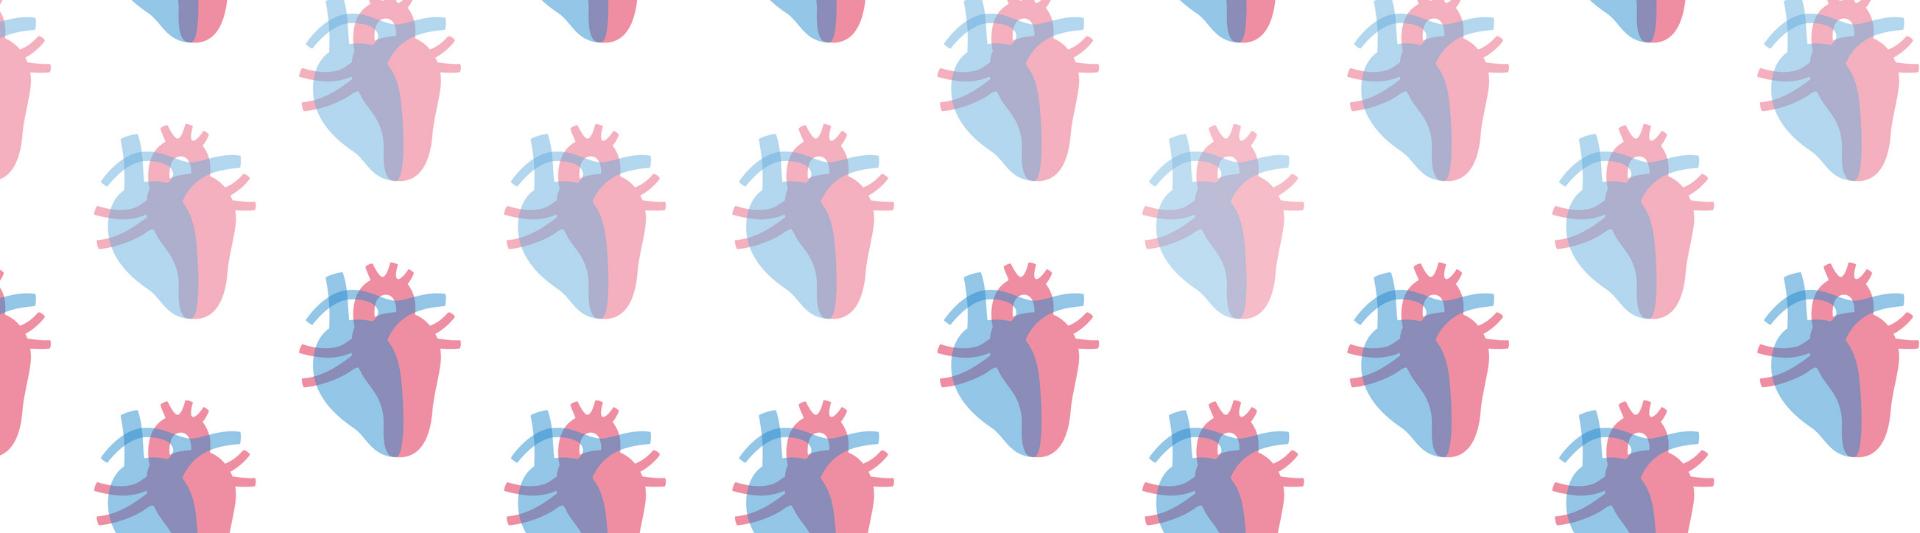 The 7th Annual Cardiovascular Summit:  A Multidisciplinary Team Approach, CME Webinar Recording